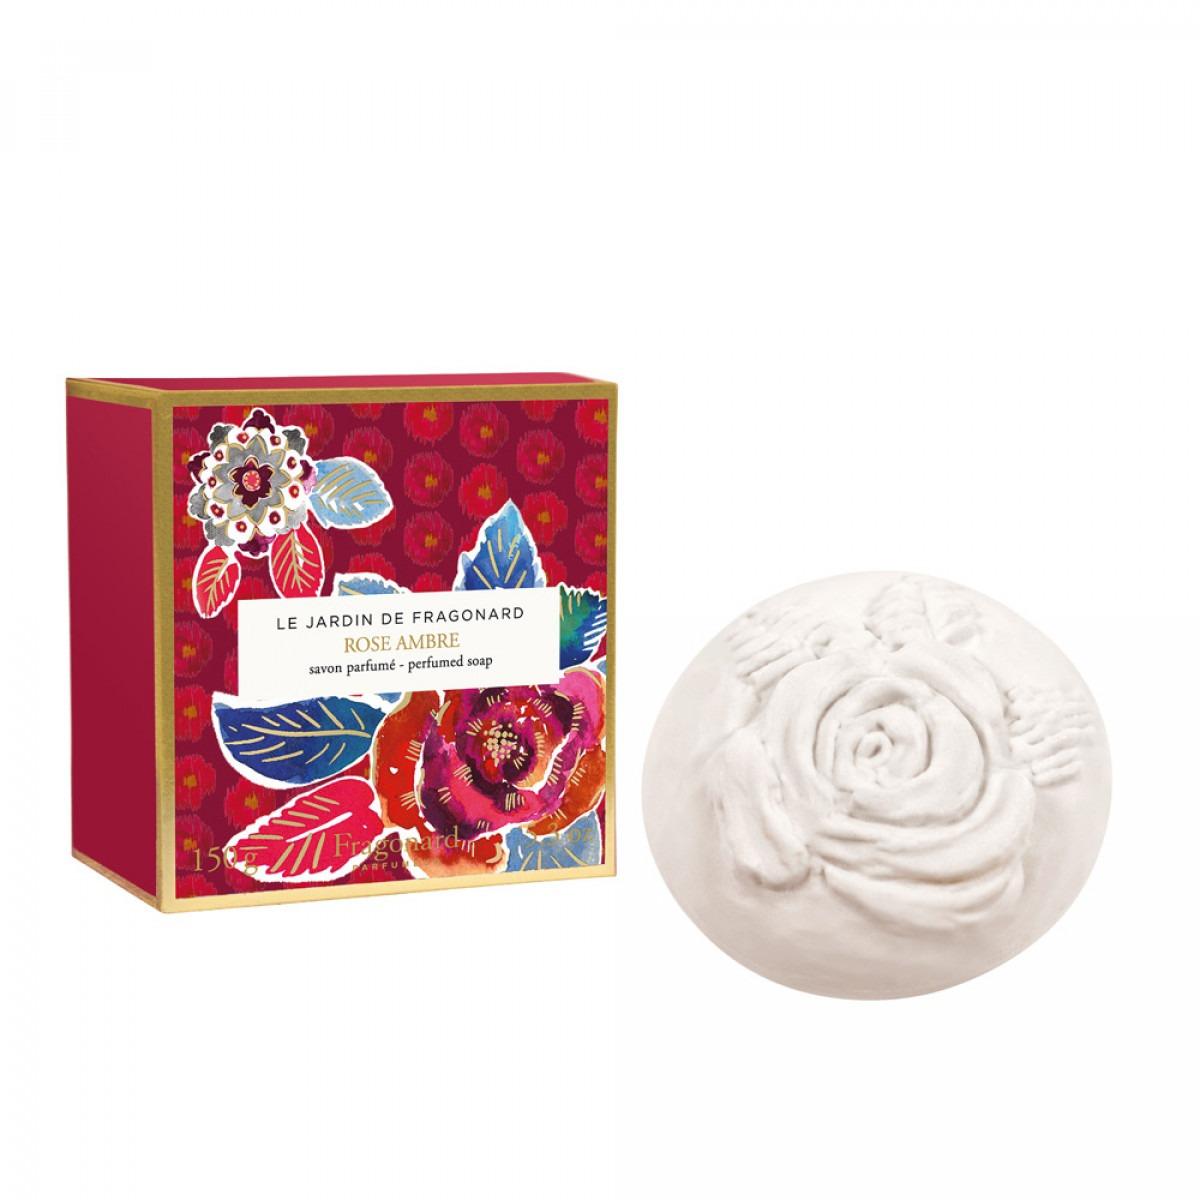 Le Jardin de Fragonard Rose Ambre - Single Soap